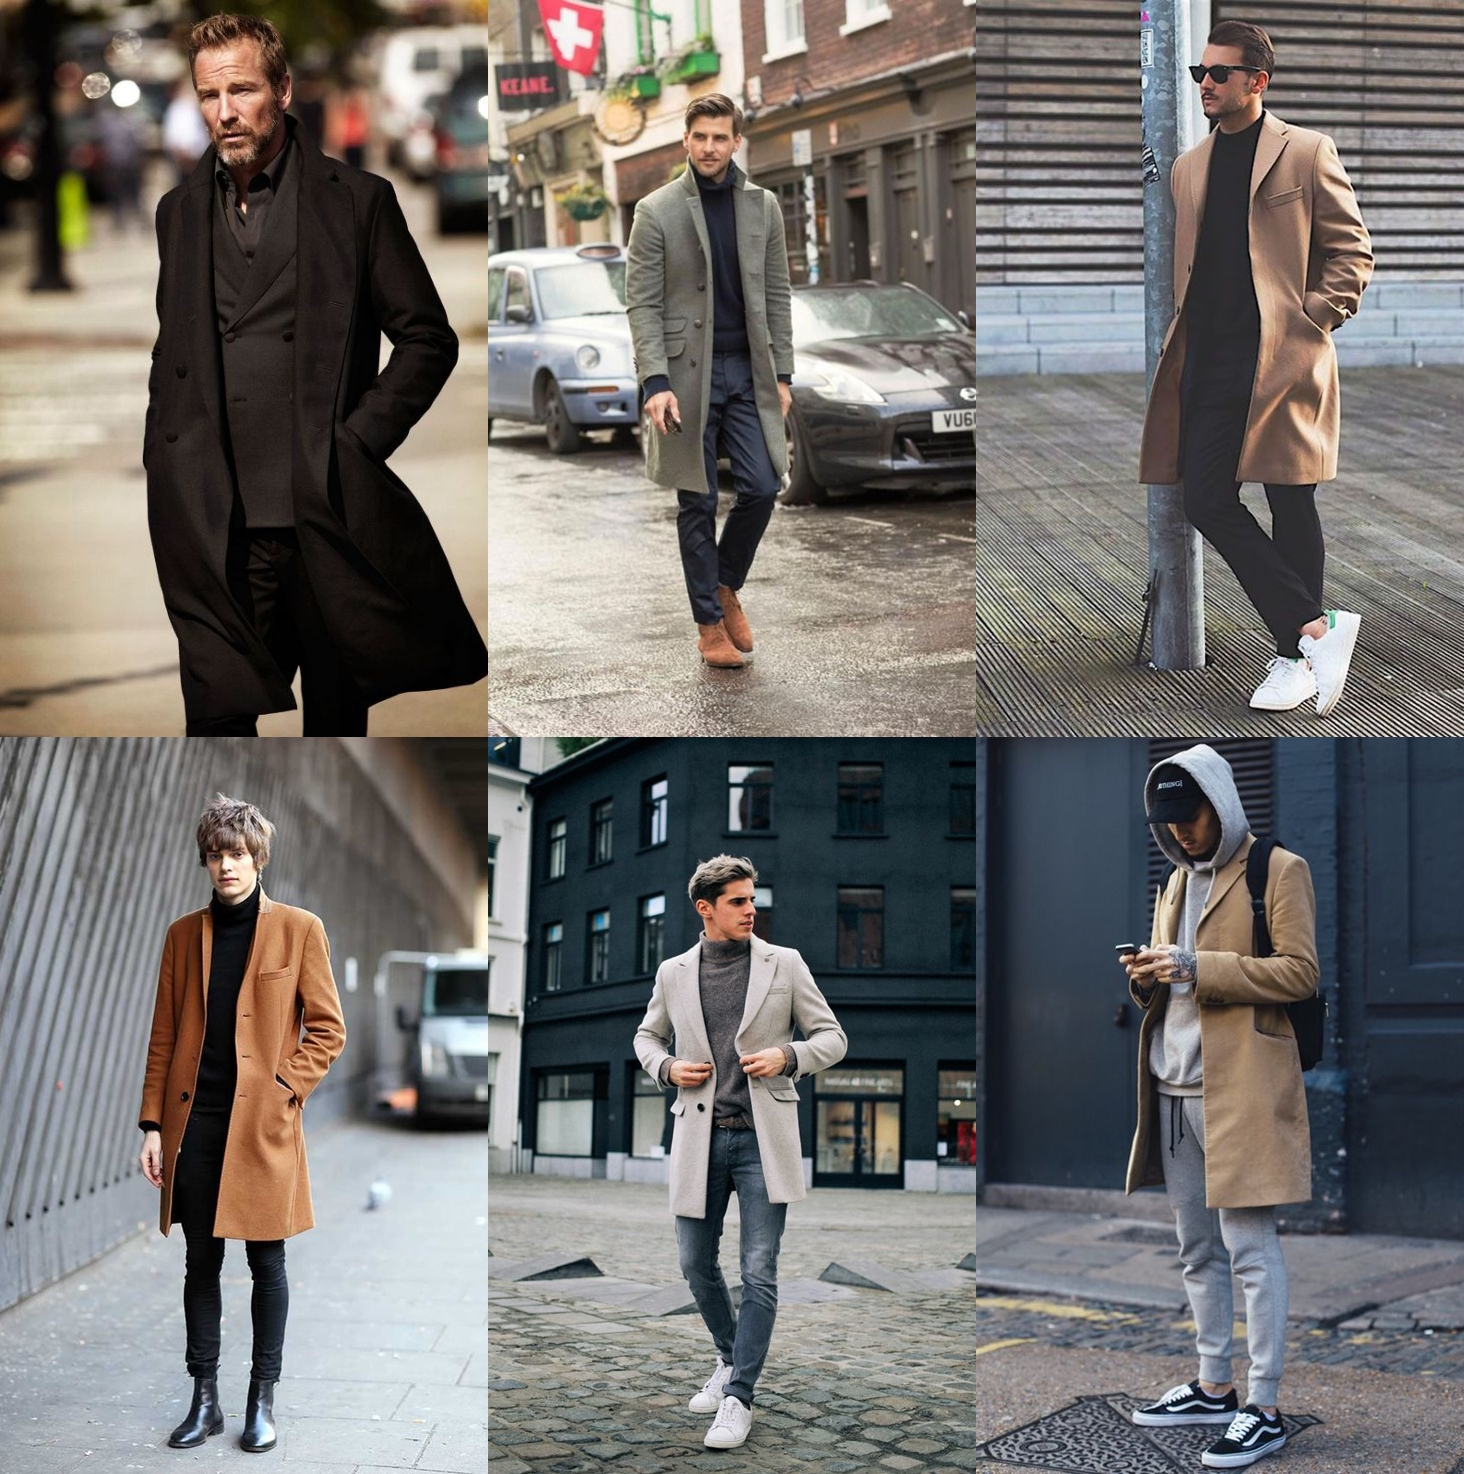 jaqueta masculina, , jacket for men, tendencia de moda masculina 2017, look masculino 2017, estilo masculino, blog de moda masculina, moda sem censura, alex cursino, 5